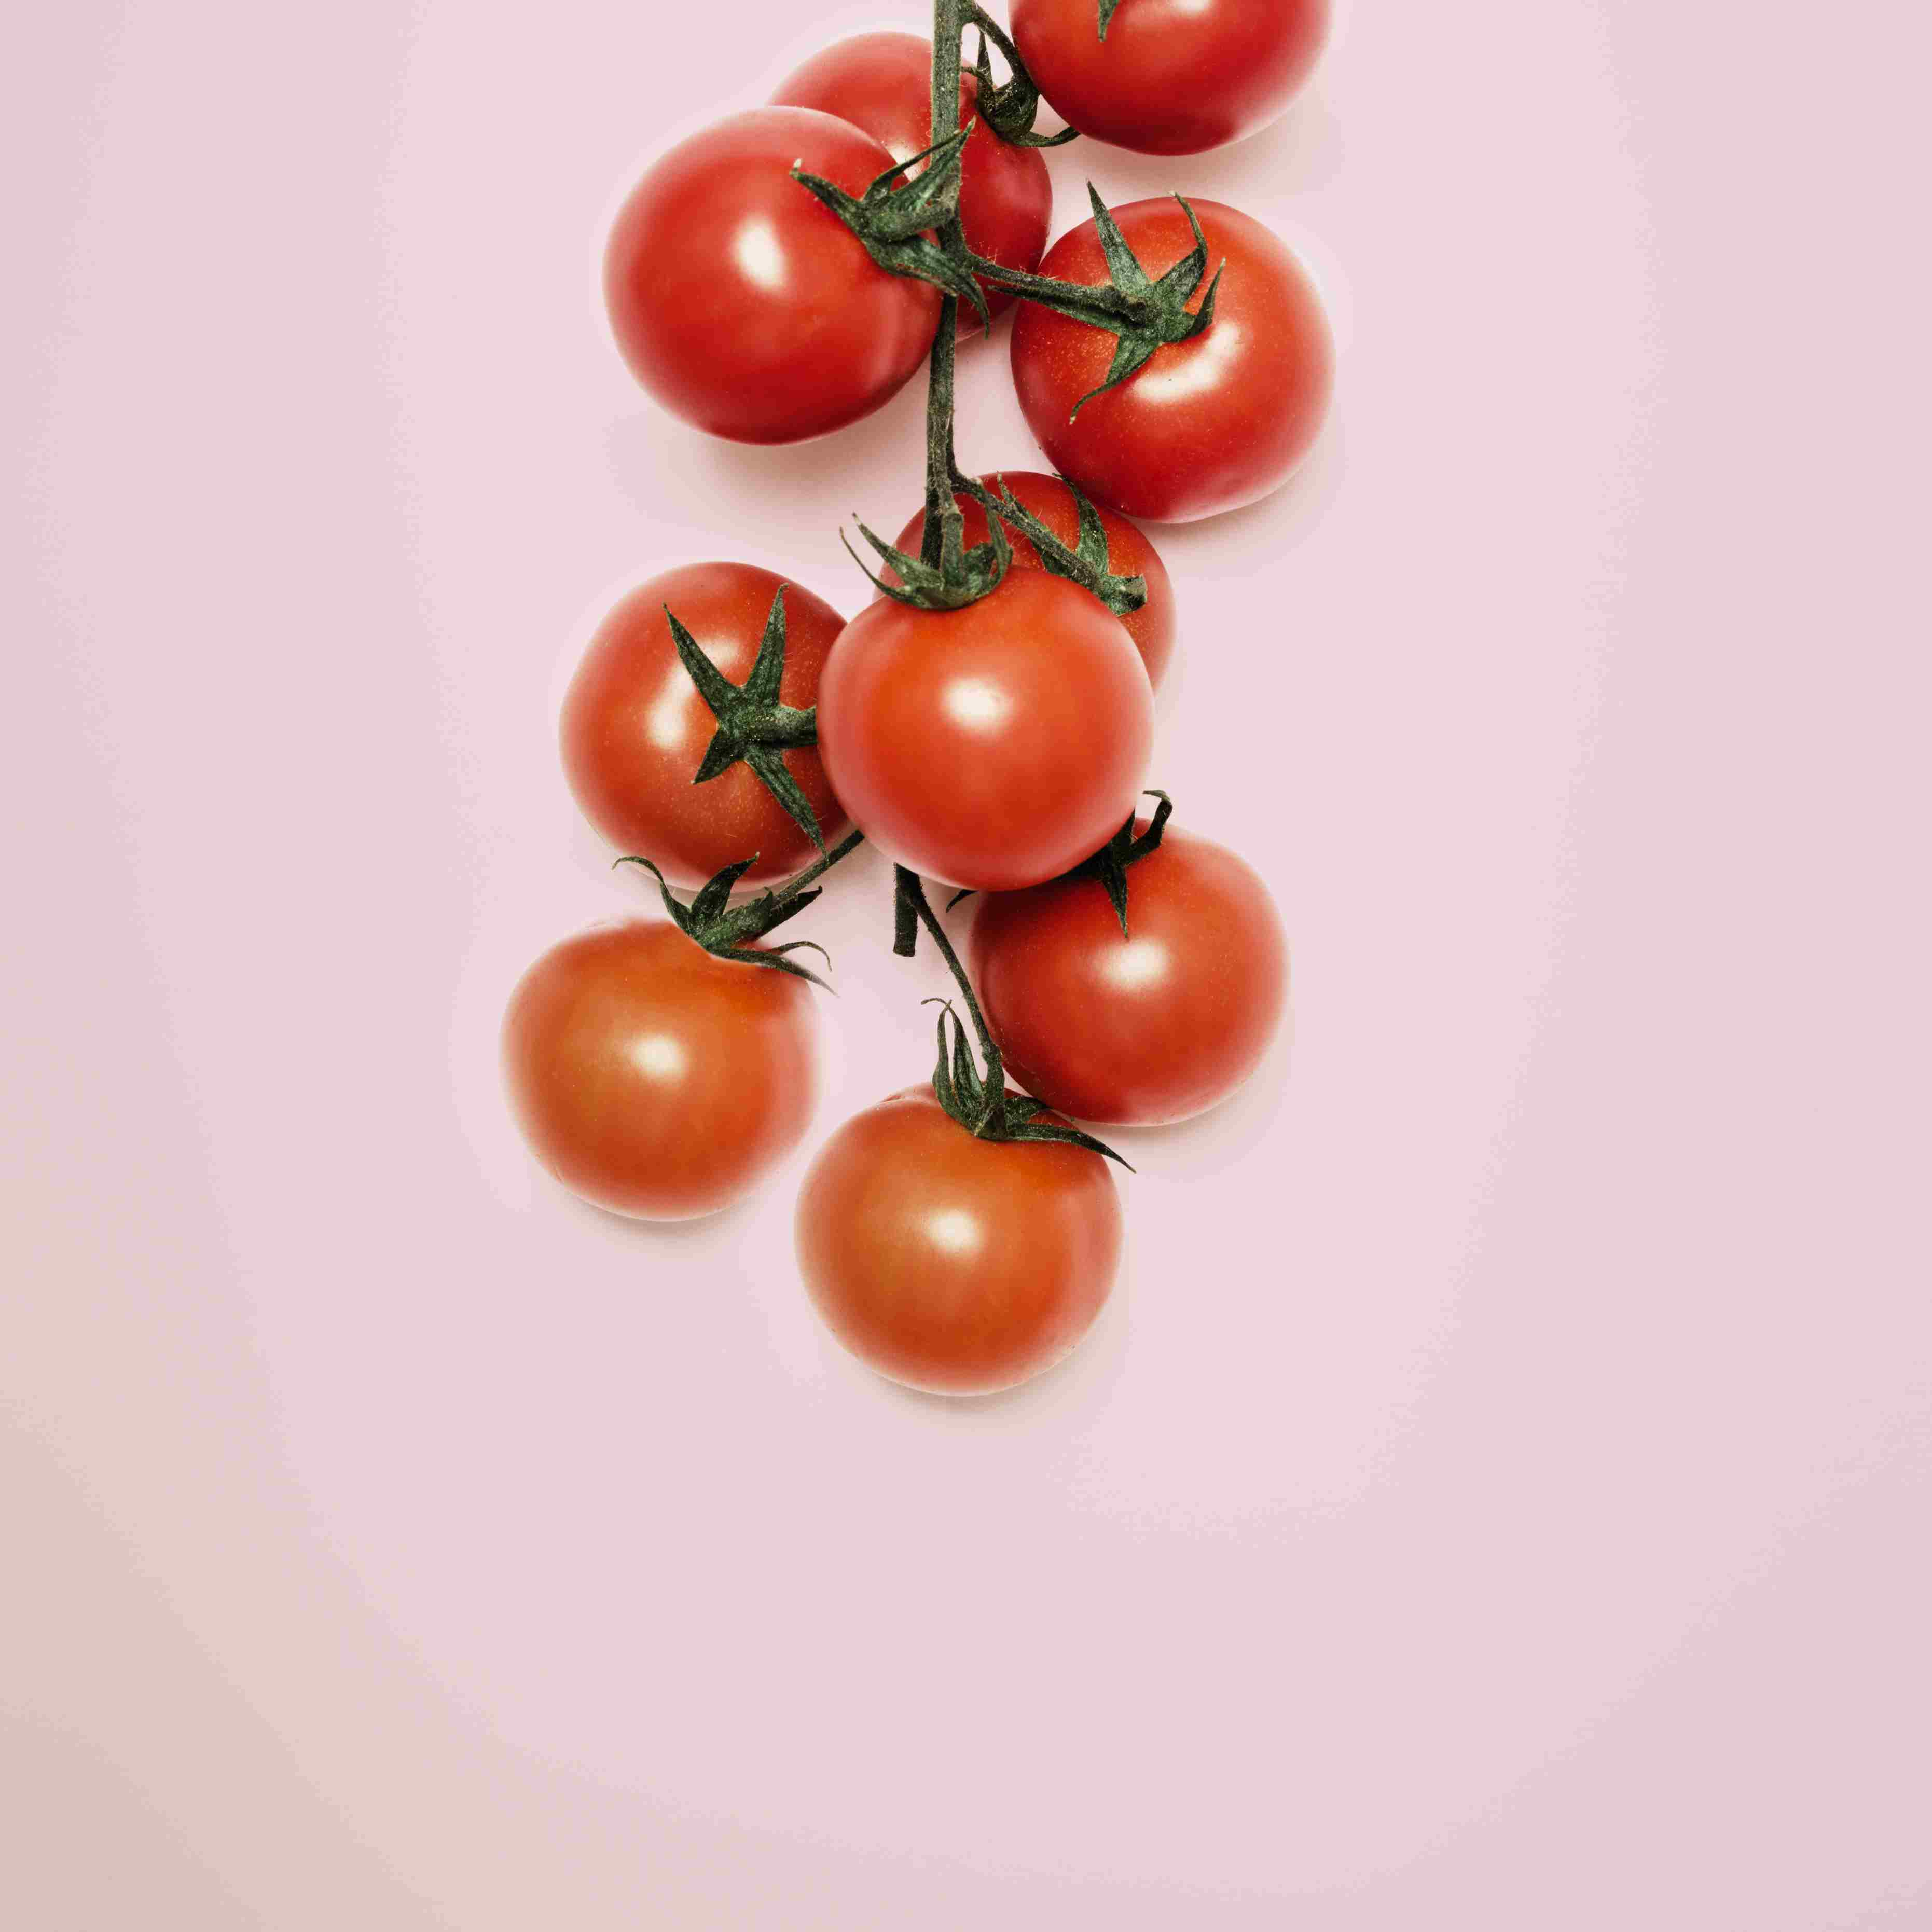 Closeup of cherry tomatoes